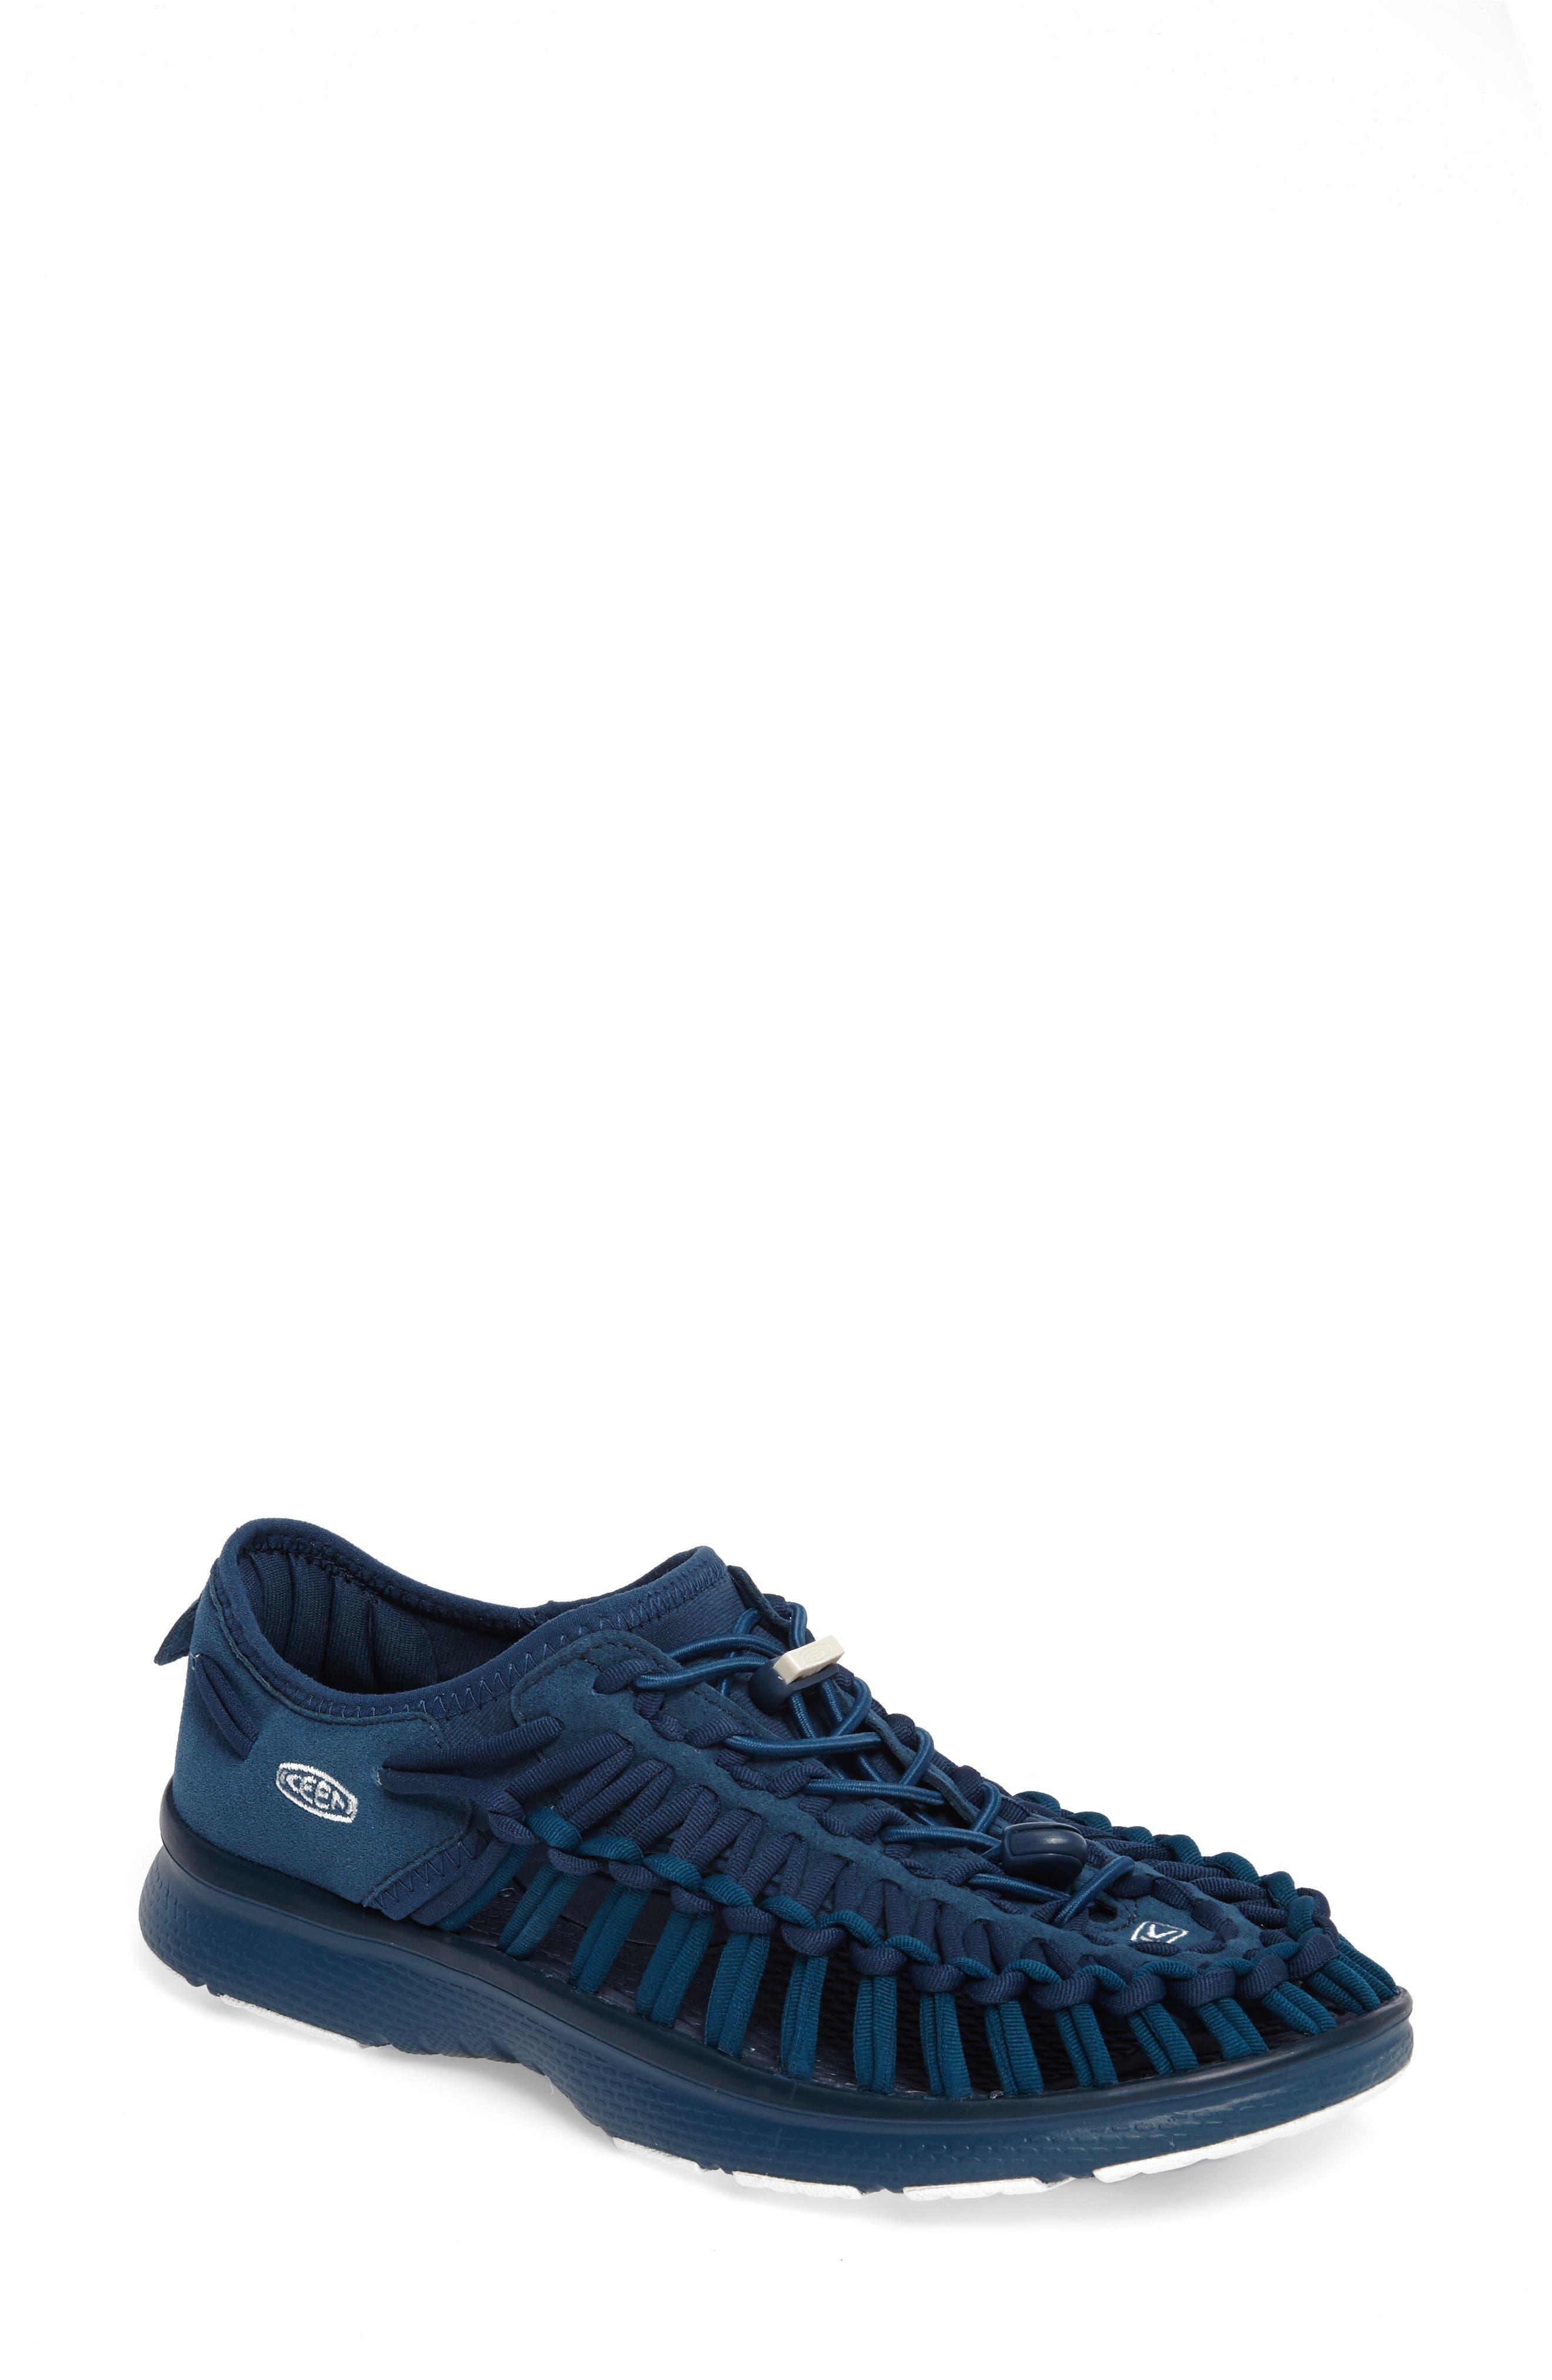 Alternate Image 1 Selected - Keen Uneek Water Sneaker (Women)